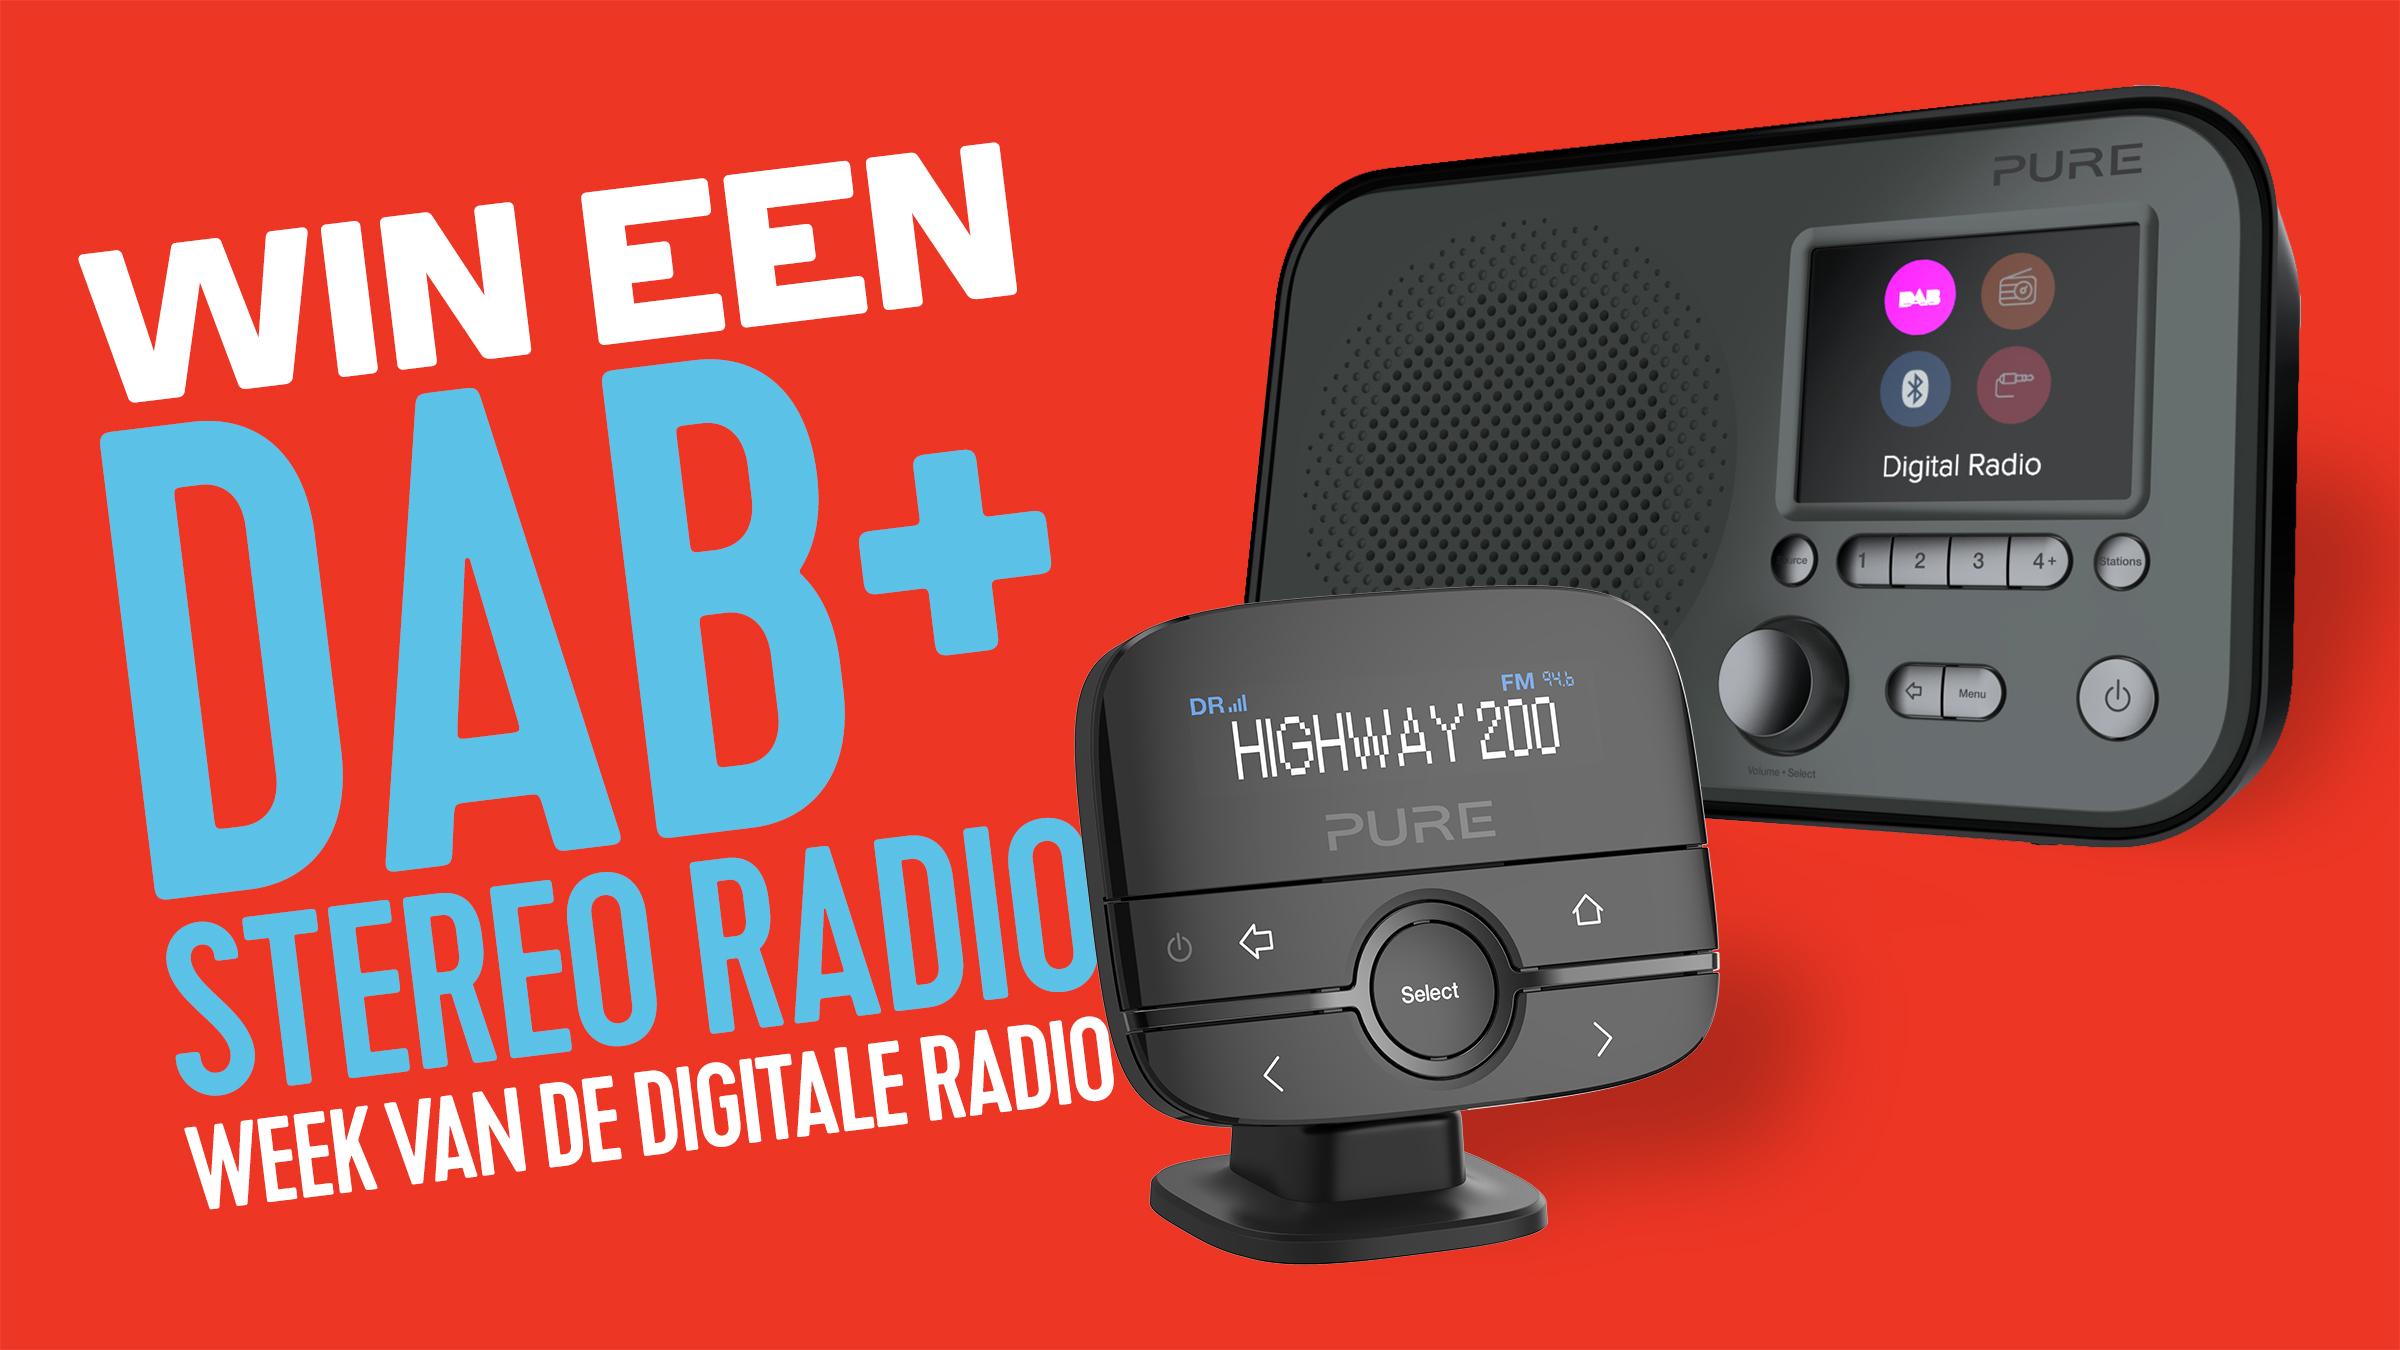 Qmusic teaser digitaleradio 2017